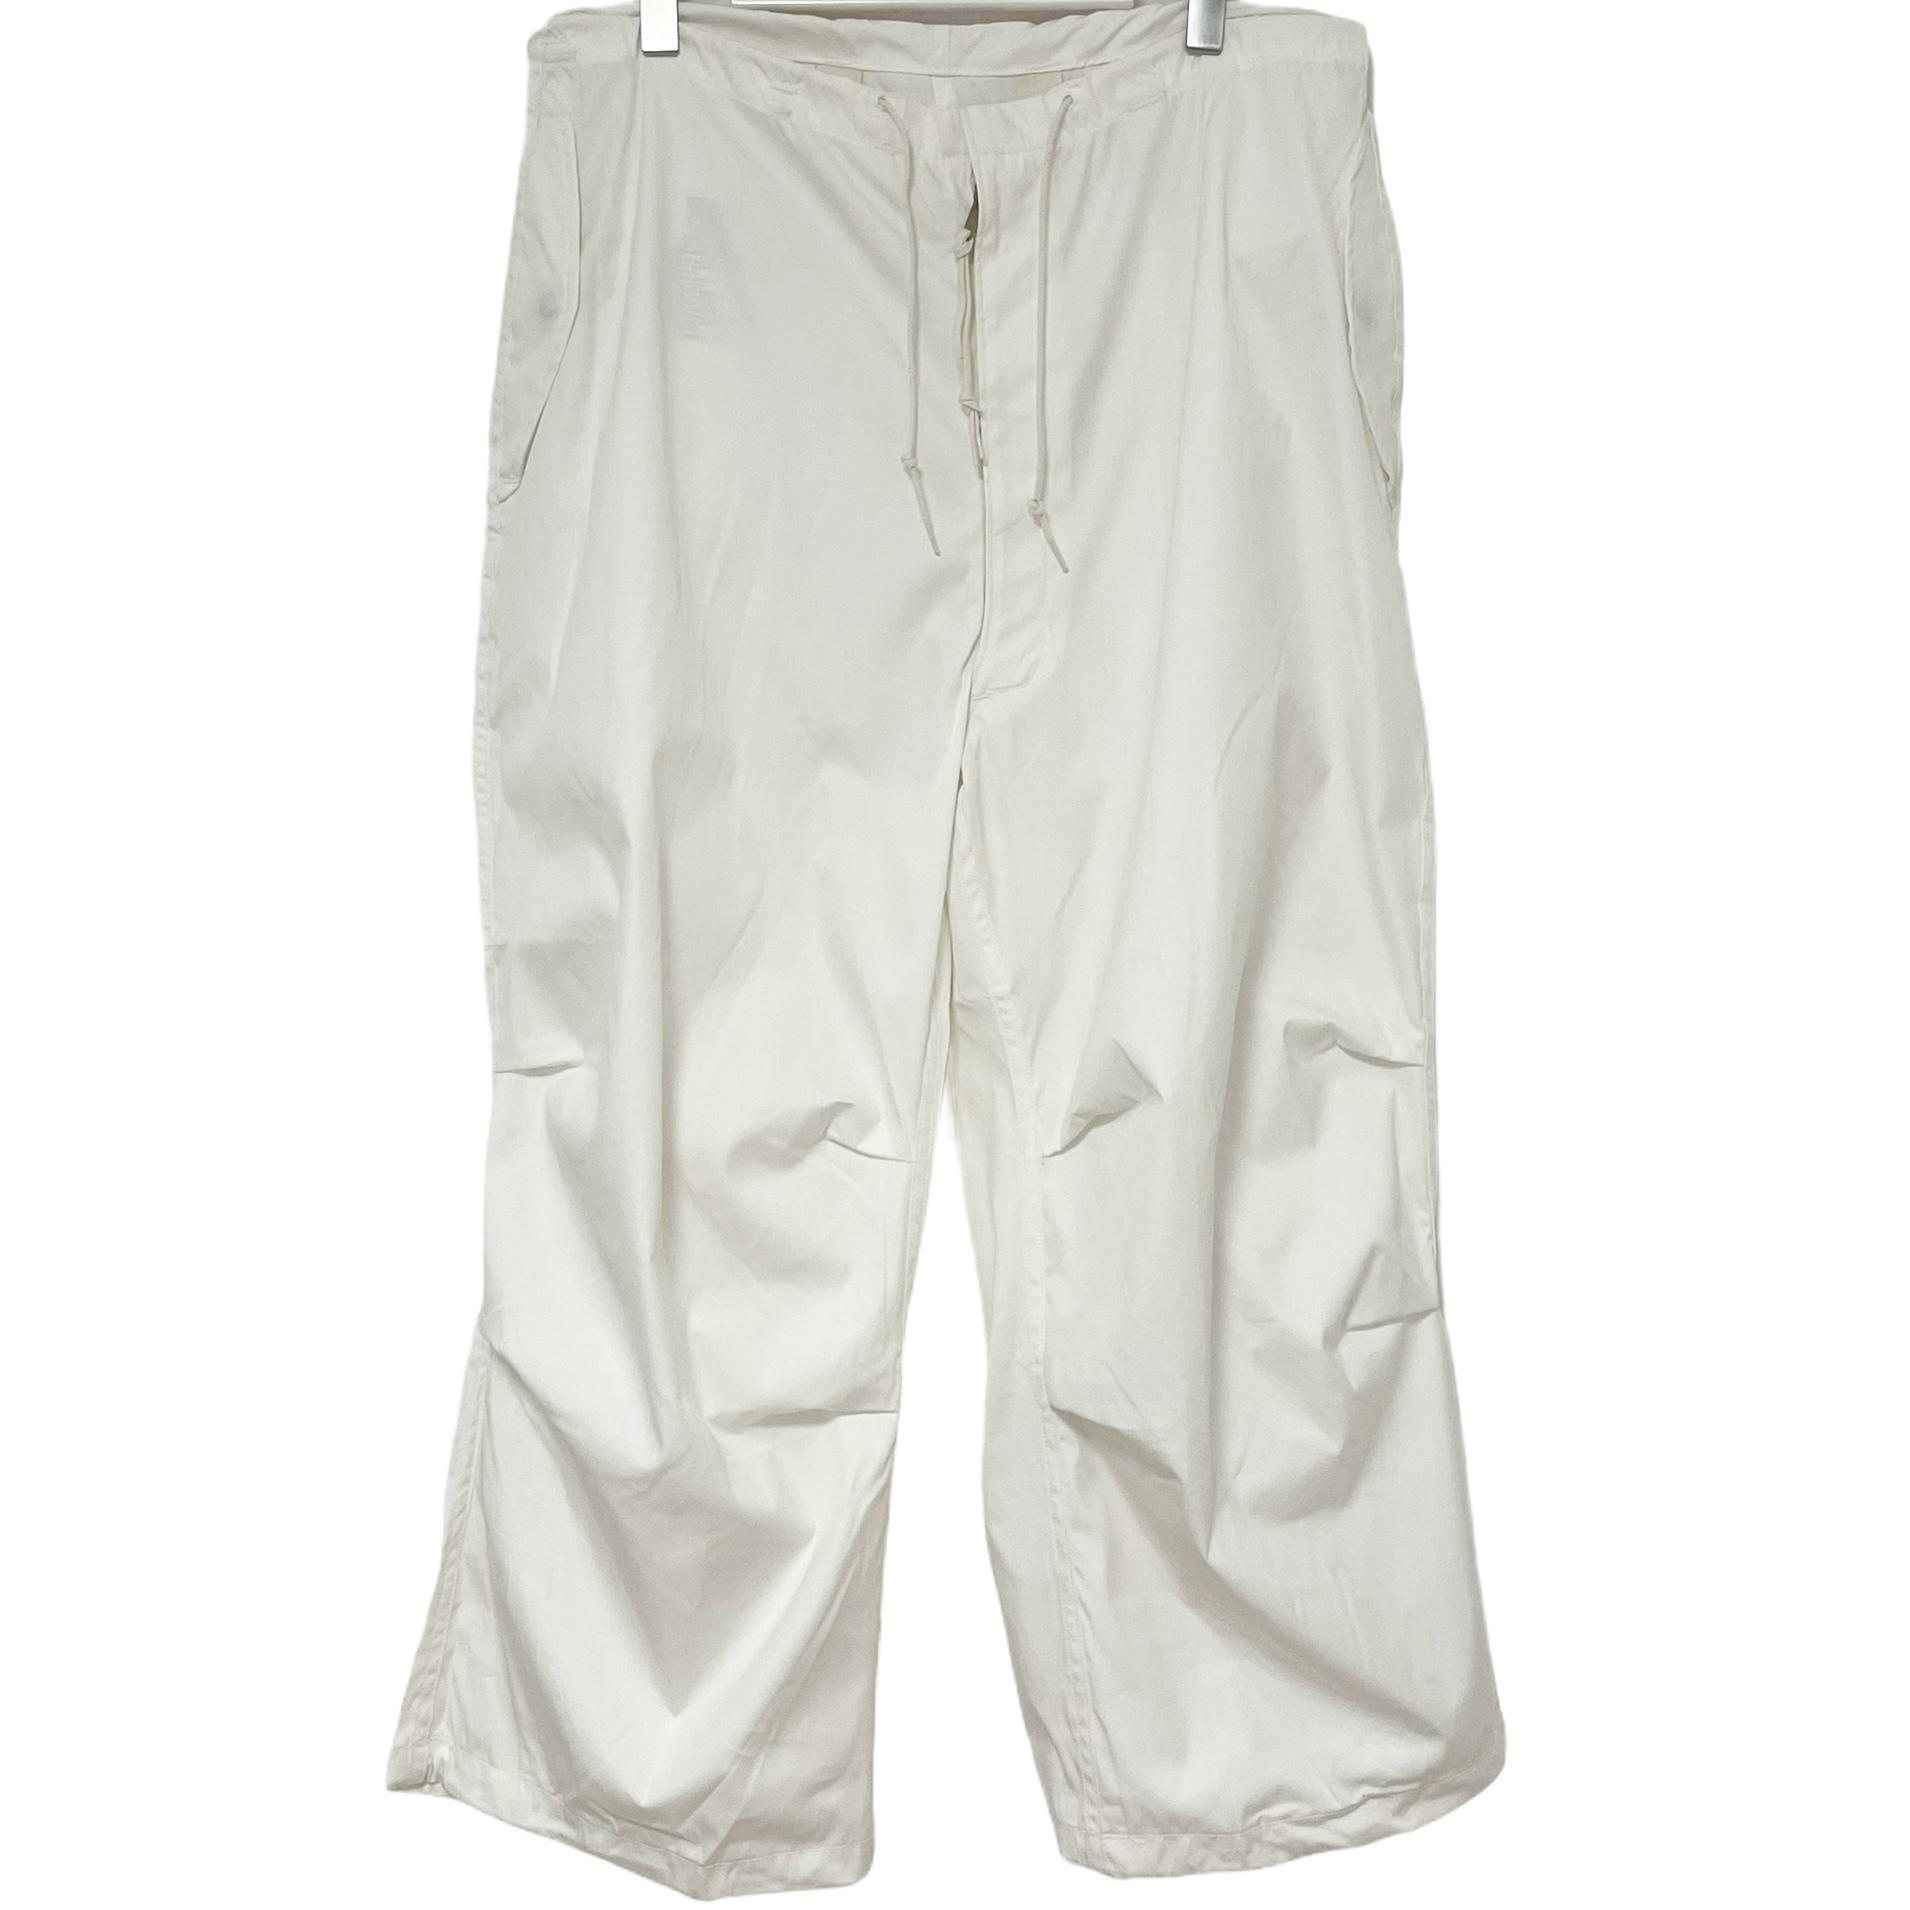 Dead Stock 90's U.S. Army Snow Camo Over Pants M-S